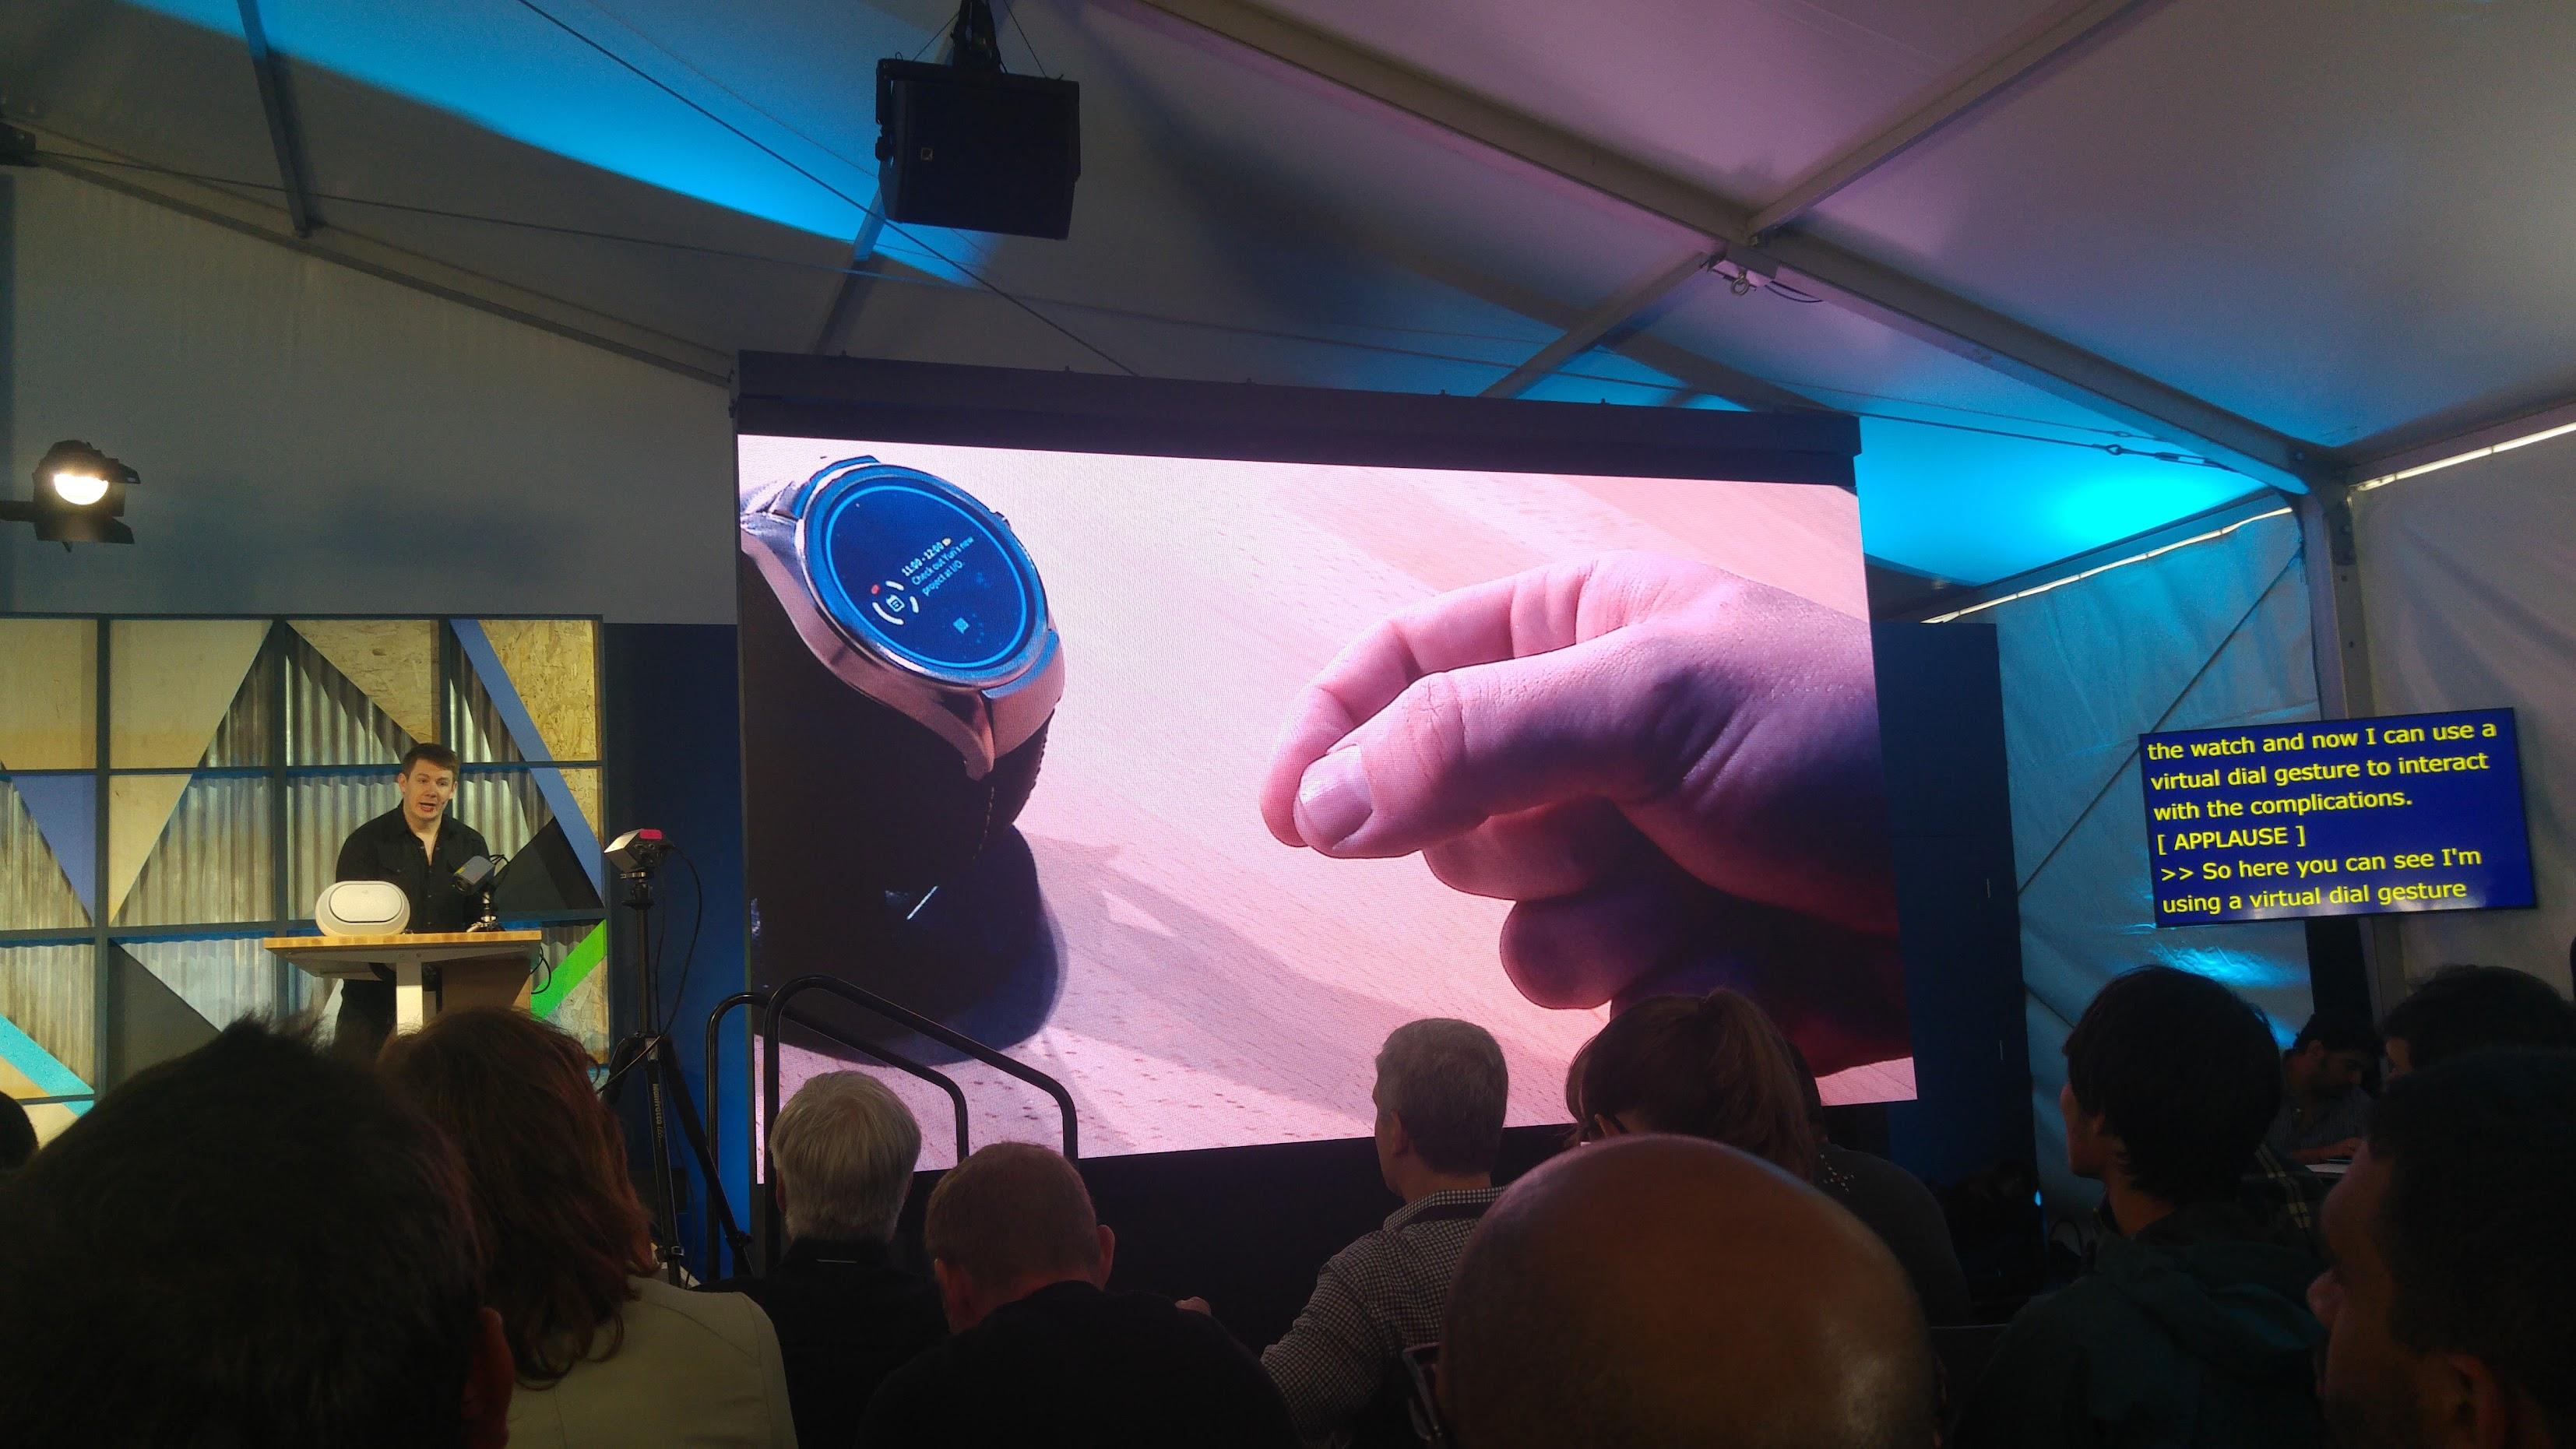 Demo of Soli radar technology at Google IO 2016, a Google ATAP project